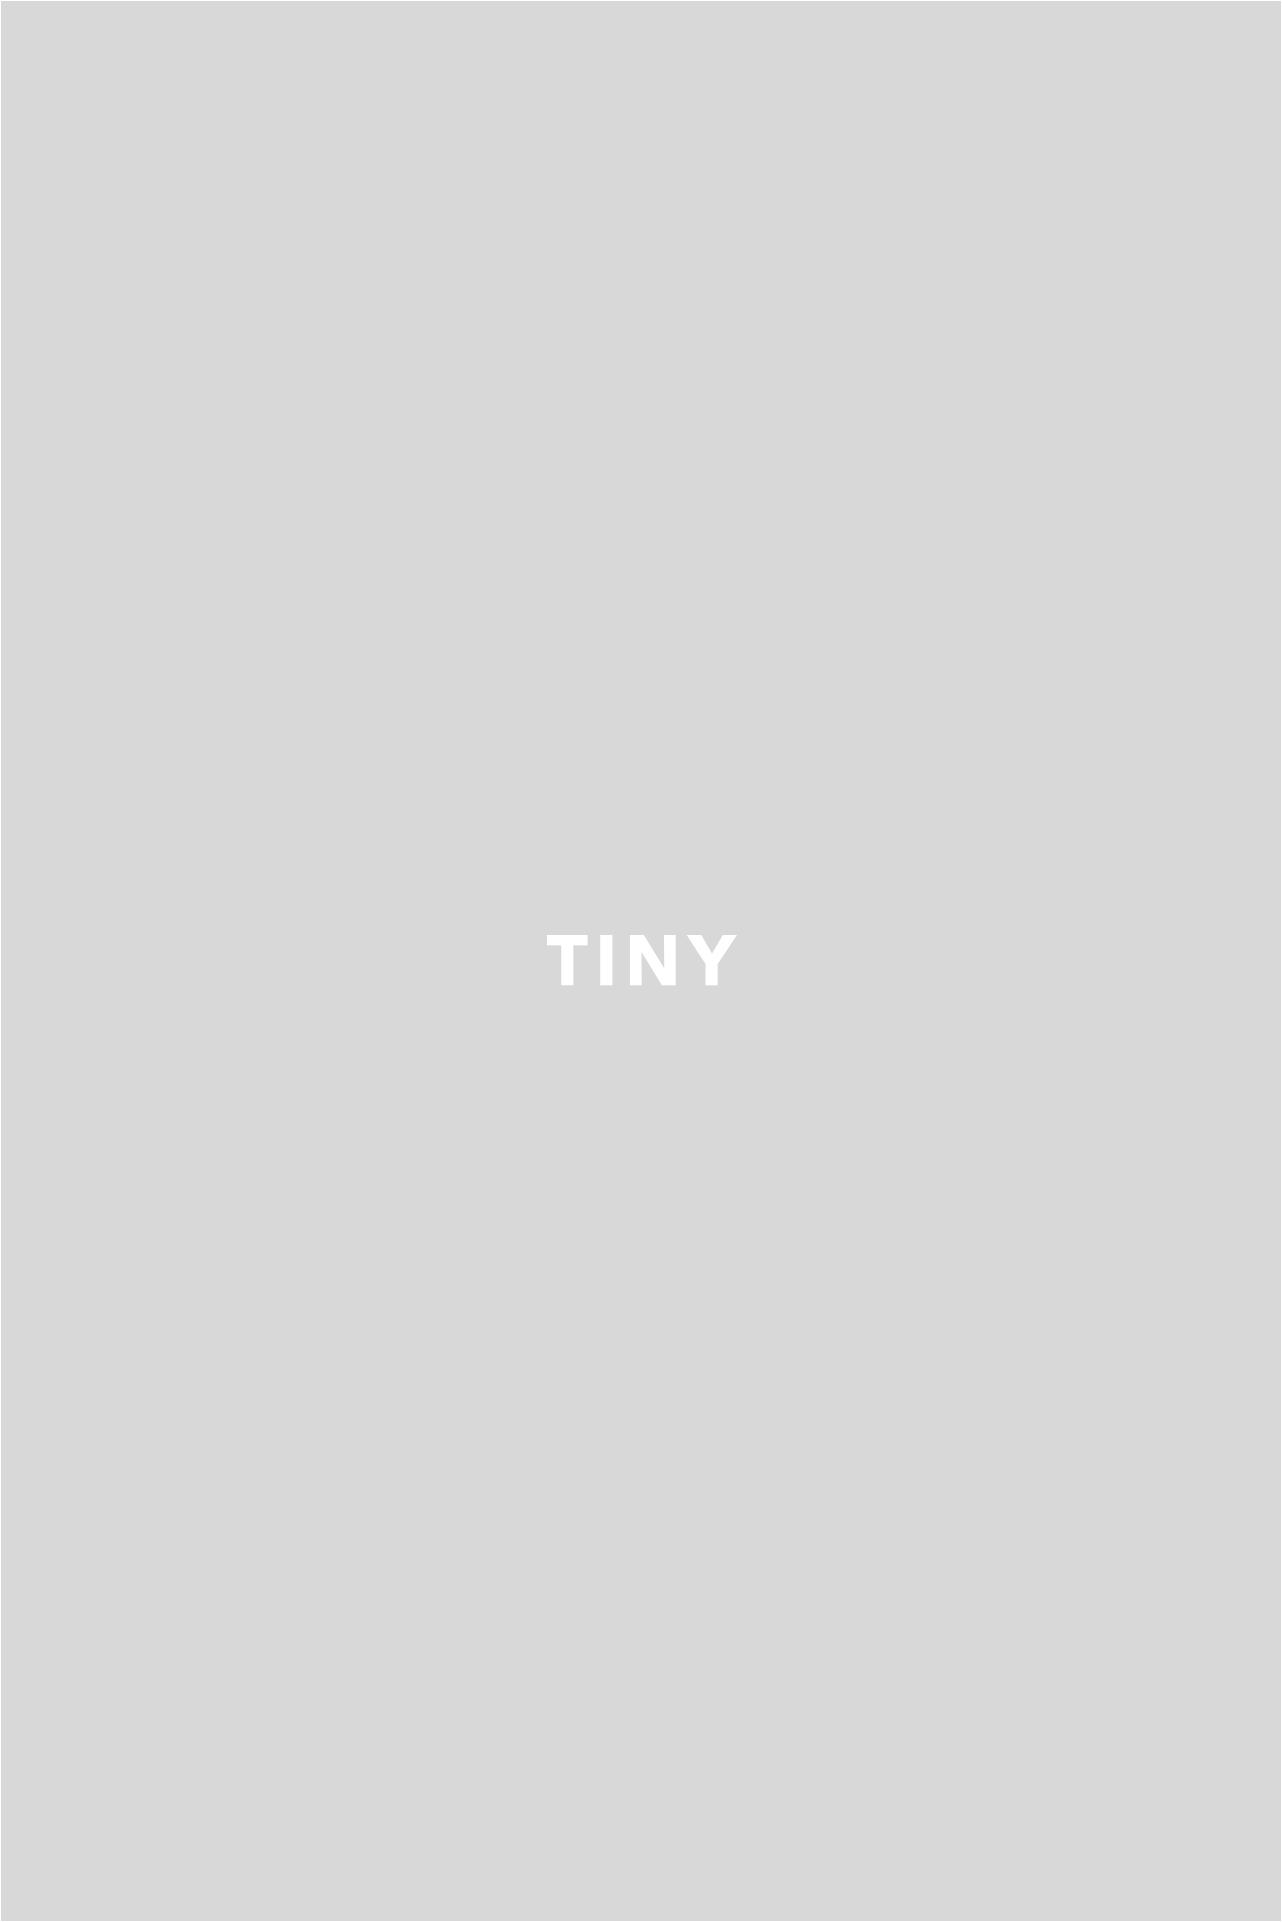 Estella Water Bottle - Coral Blush